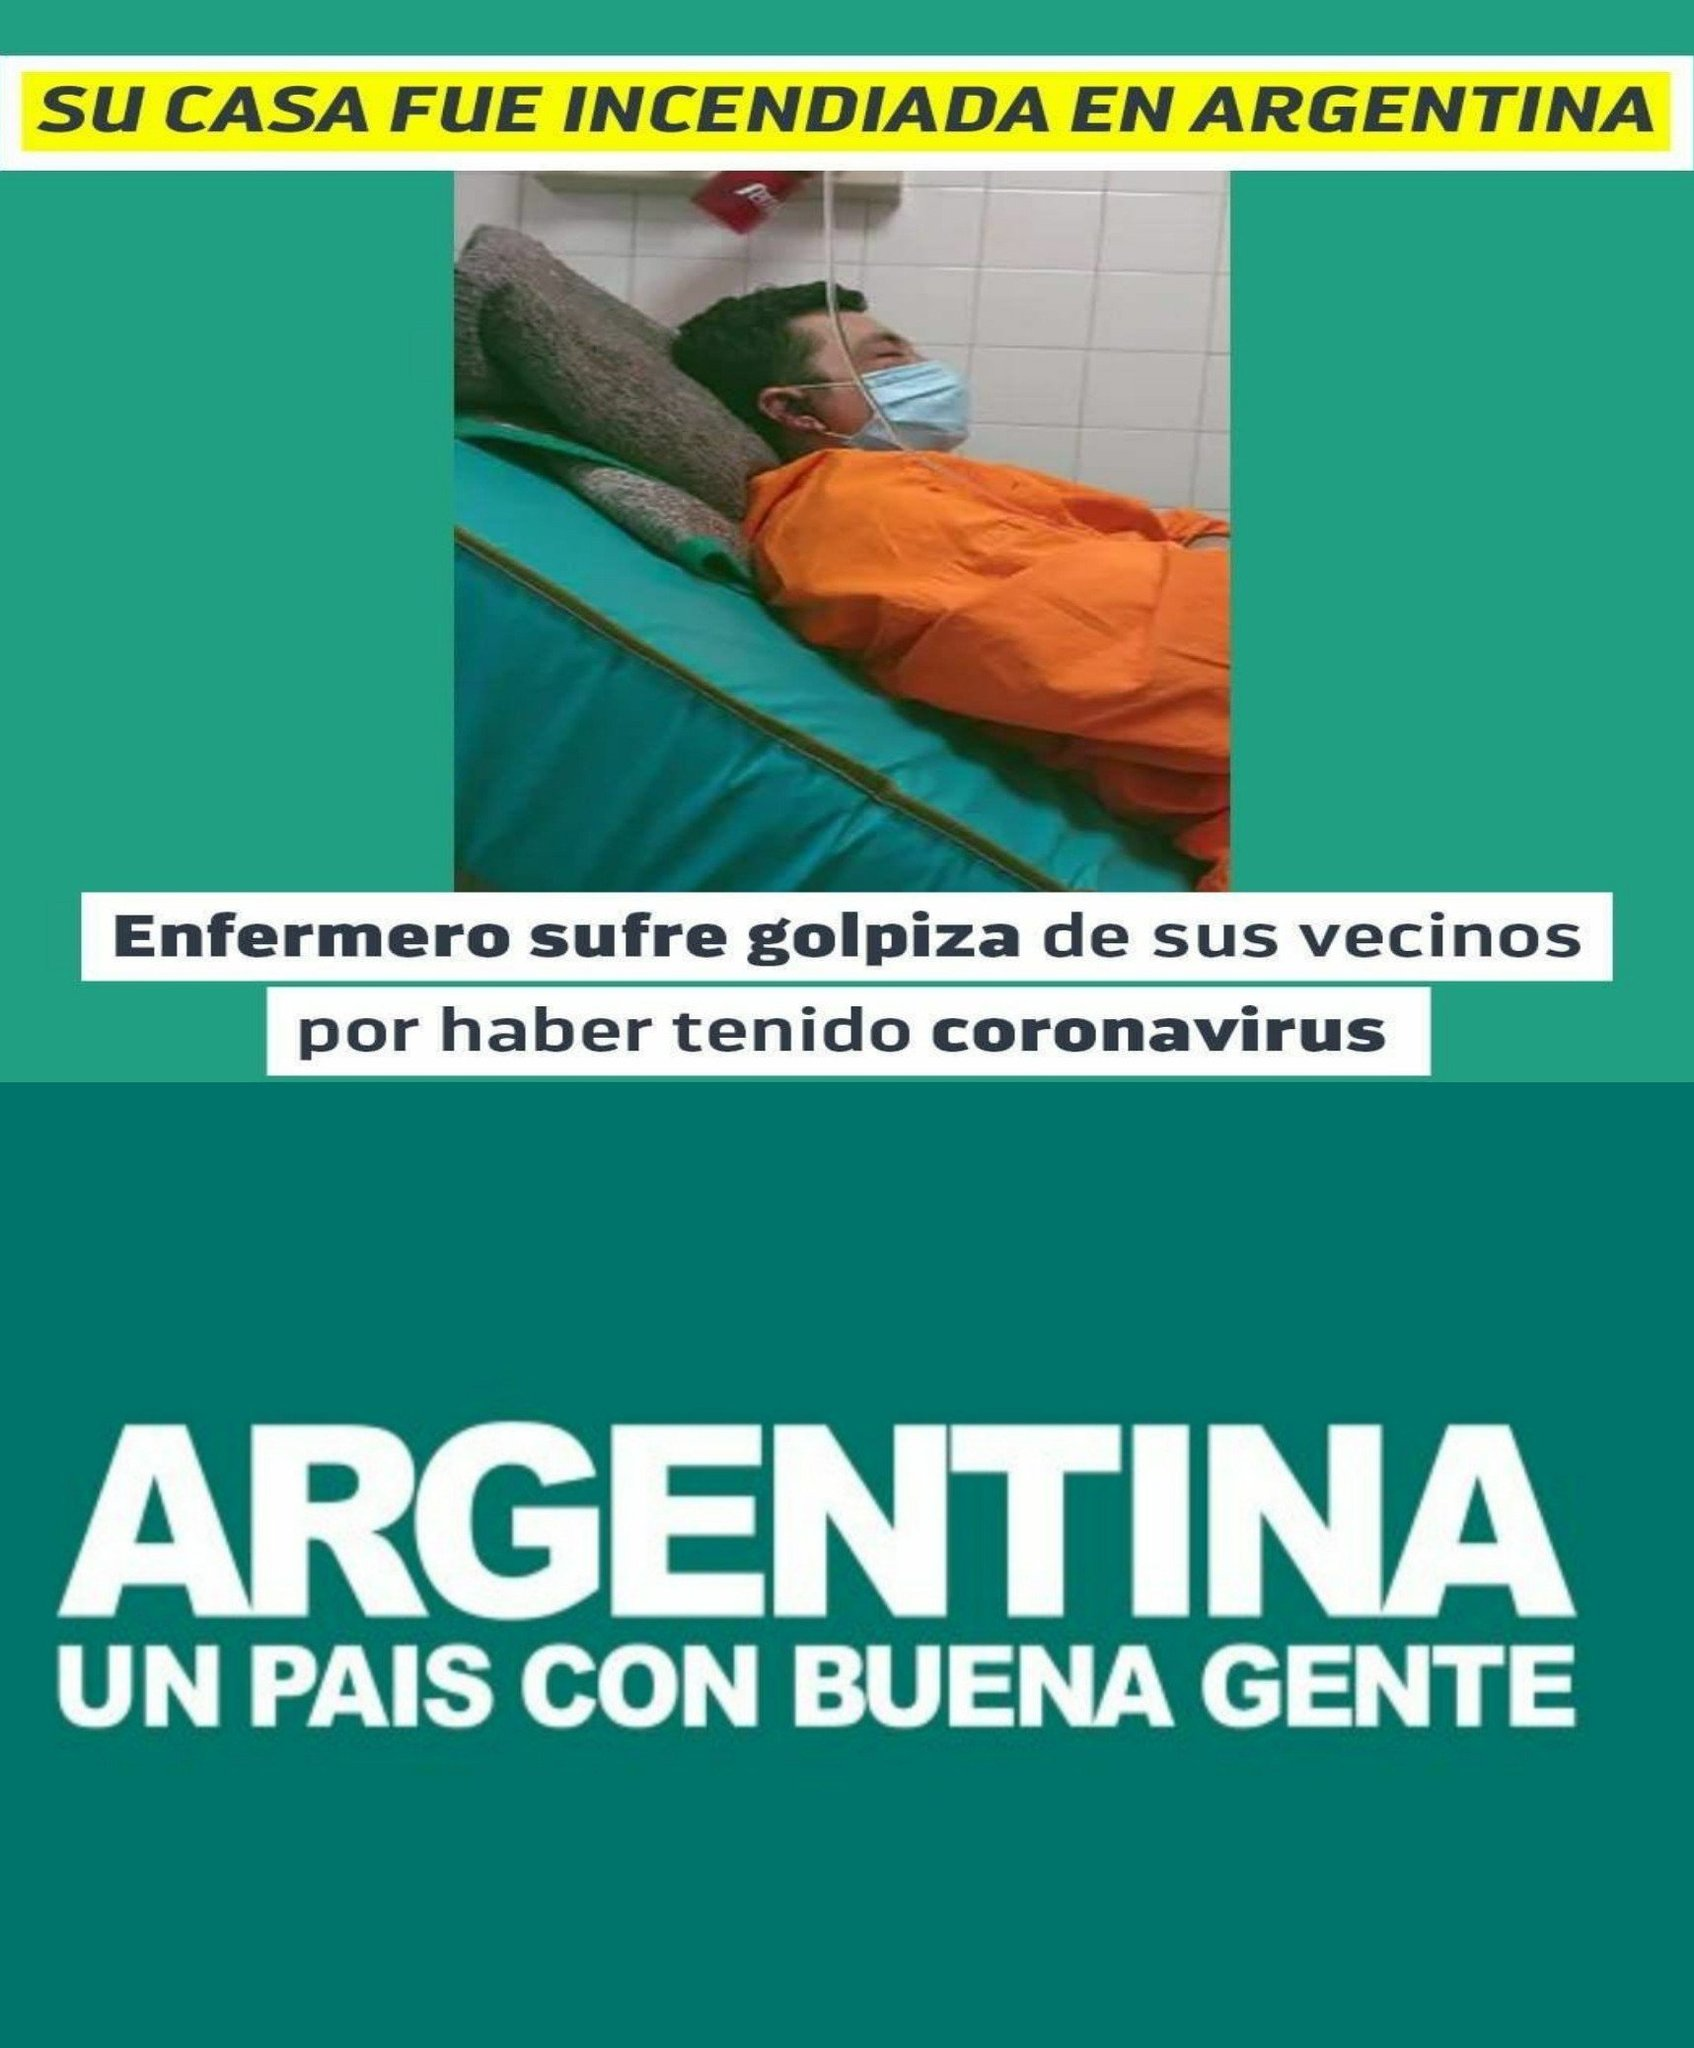 Para aclarar no tengo nada contra Argentina - meme